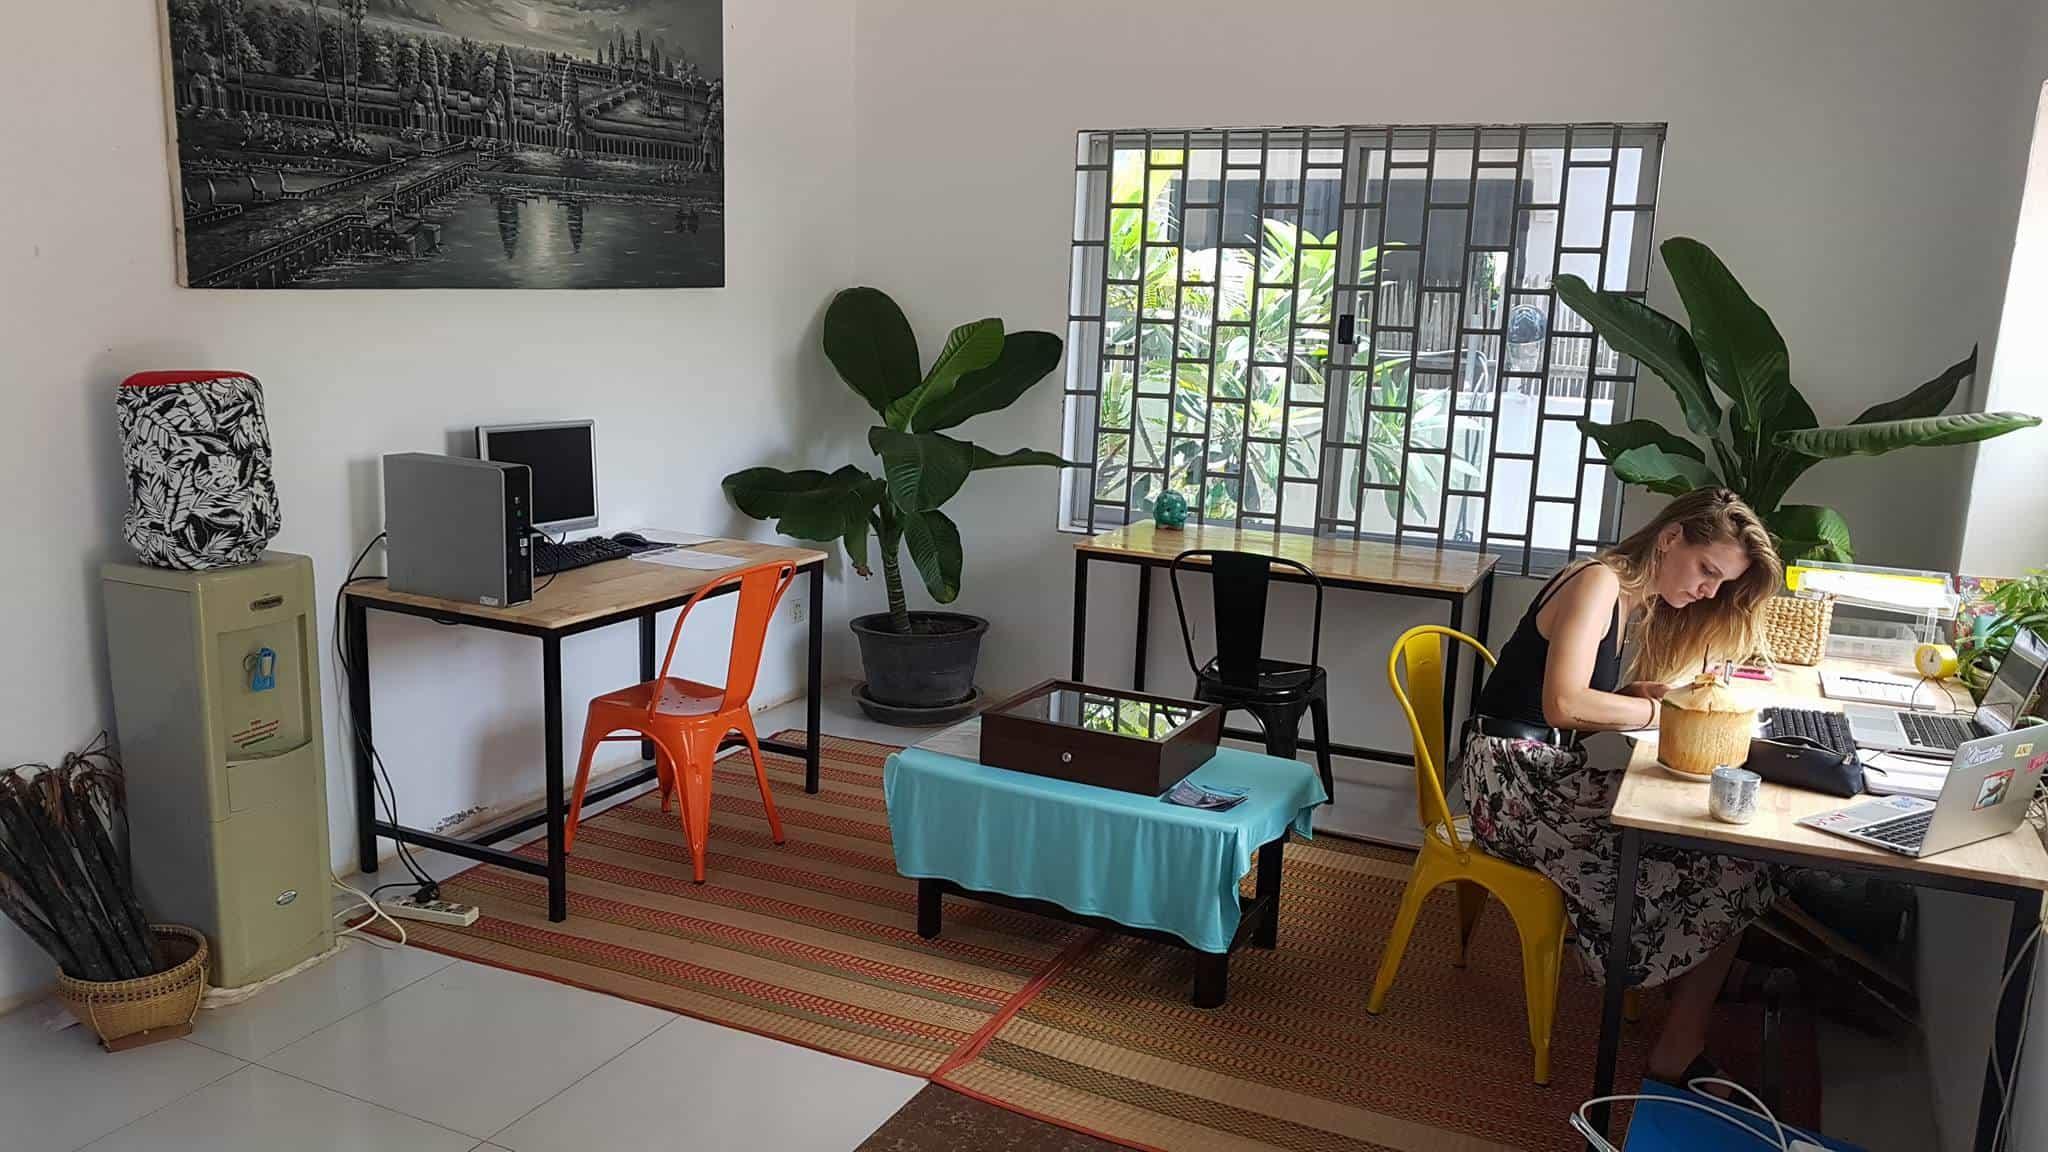 Tamara Venn Art artist in residence at Baby Elephant Boutique Hotel in Siem Reap, Cambodia